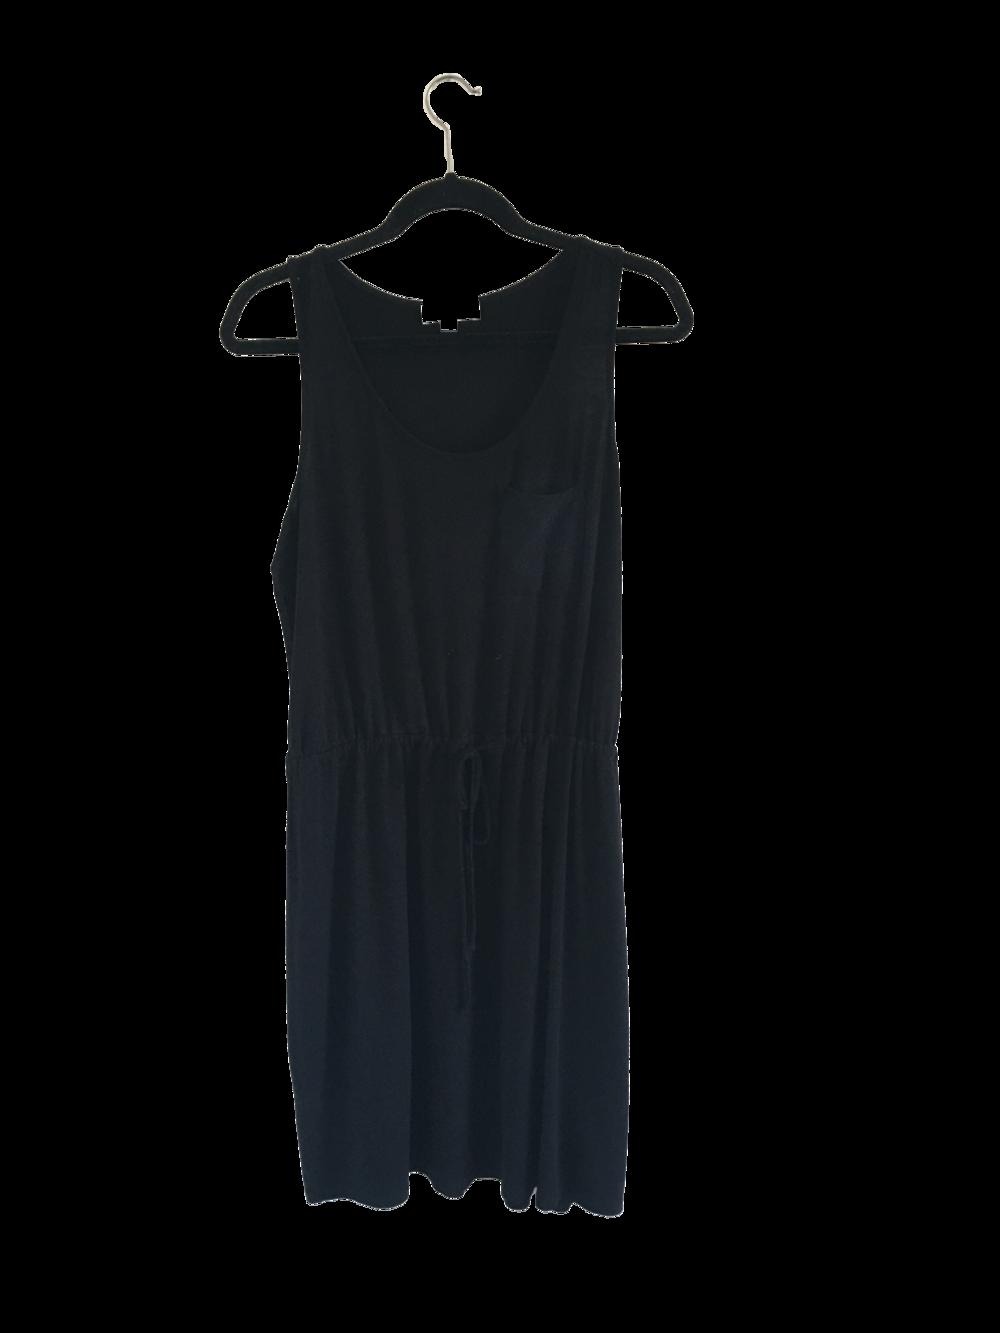 Black Tank Dress.png